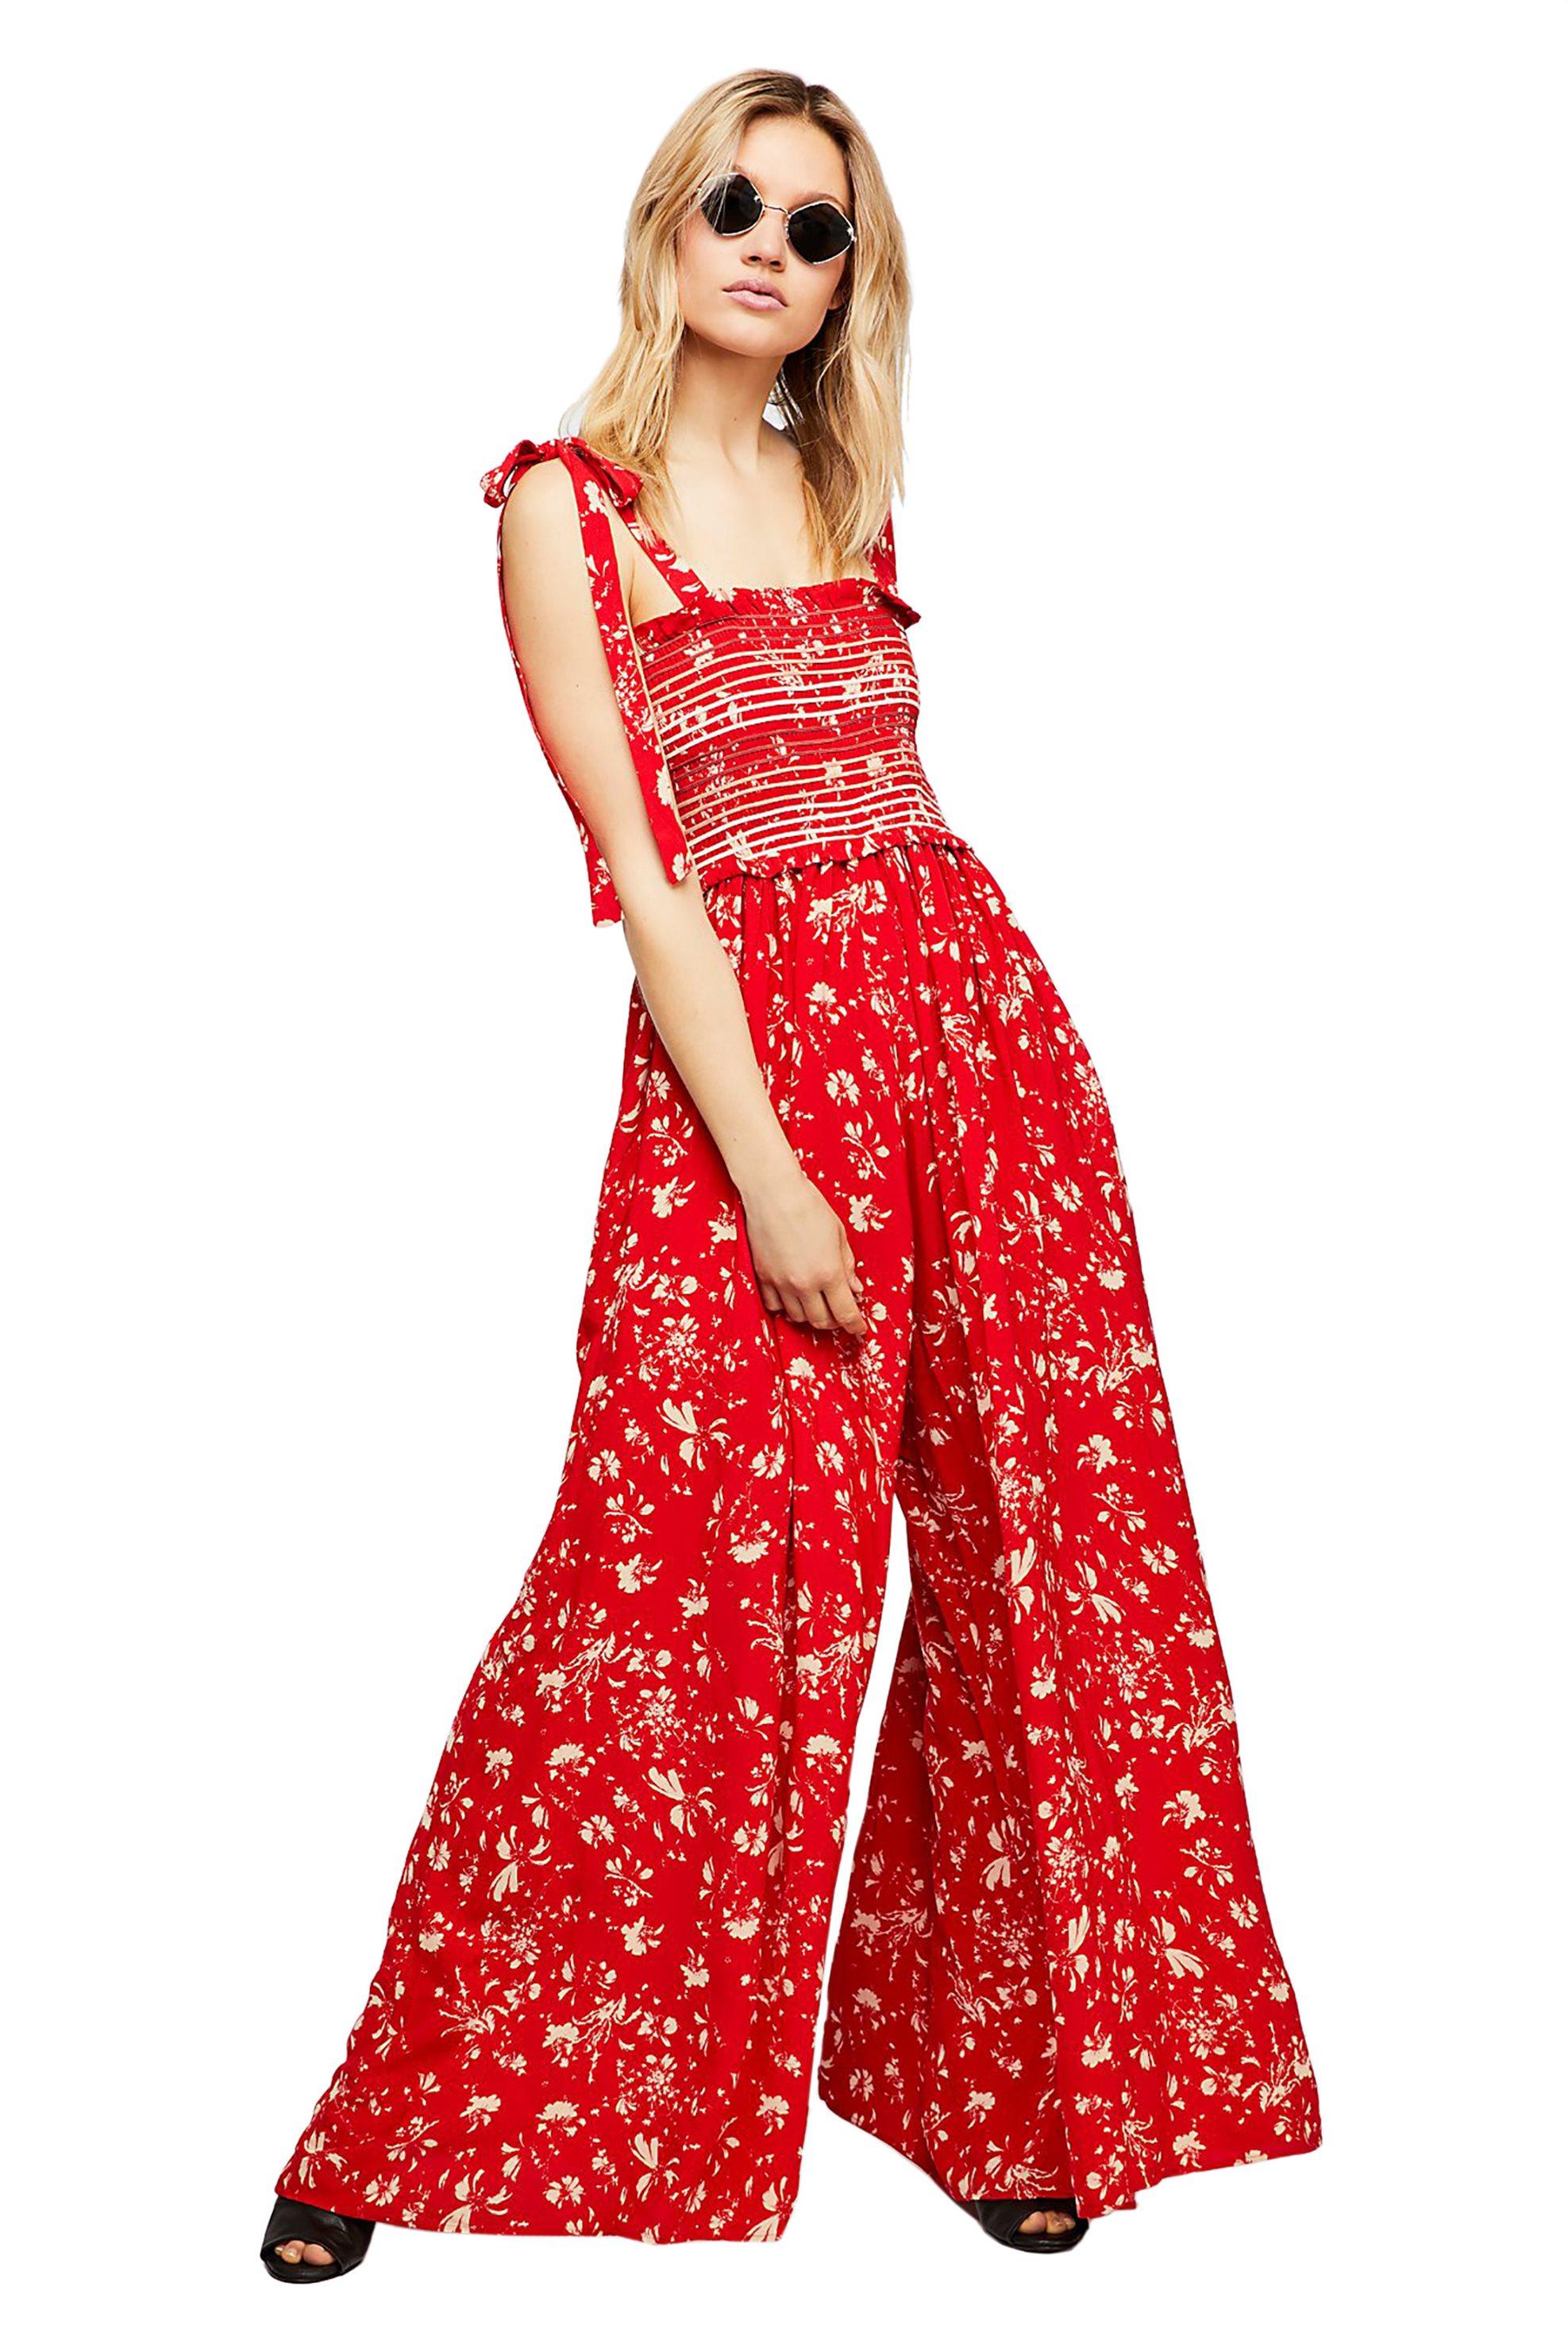 Free People γυναικεία ολόσωμη φόρμα Color My World Jumpsuit - OB814999 - Κόκκινο γυναικα   ρουχα   ολόσωμες φόρμες   σαλοπέτες